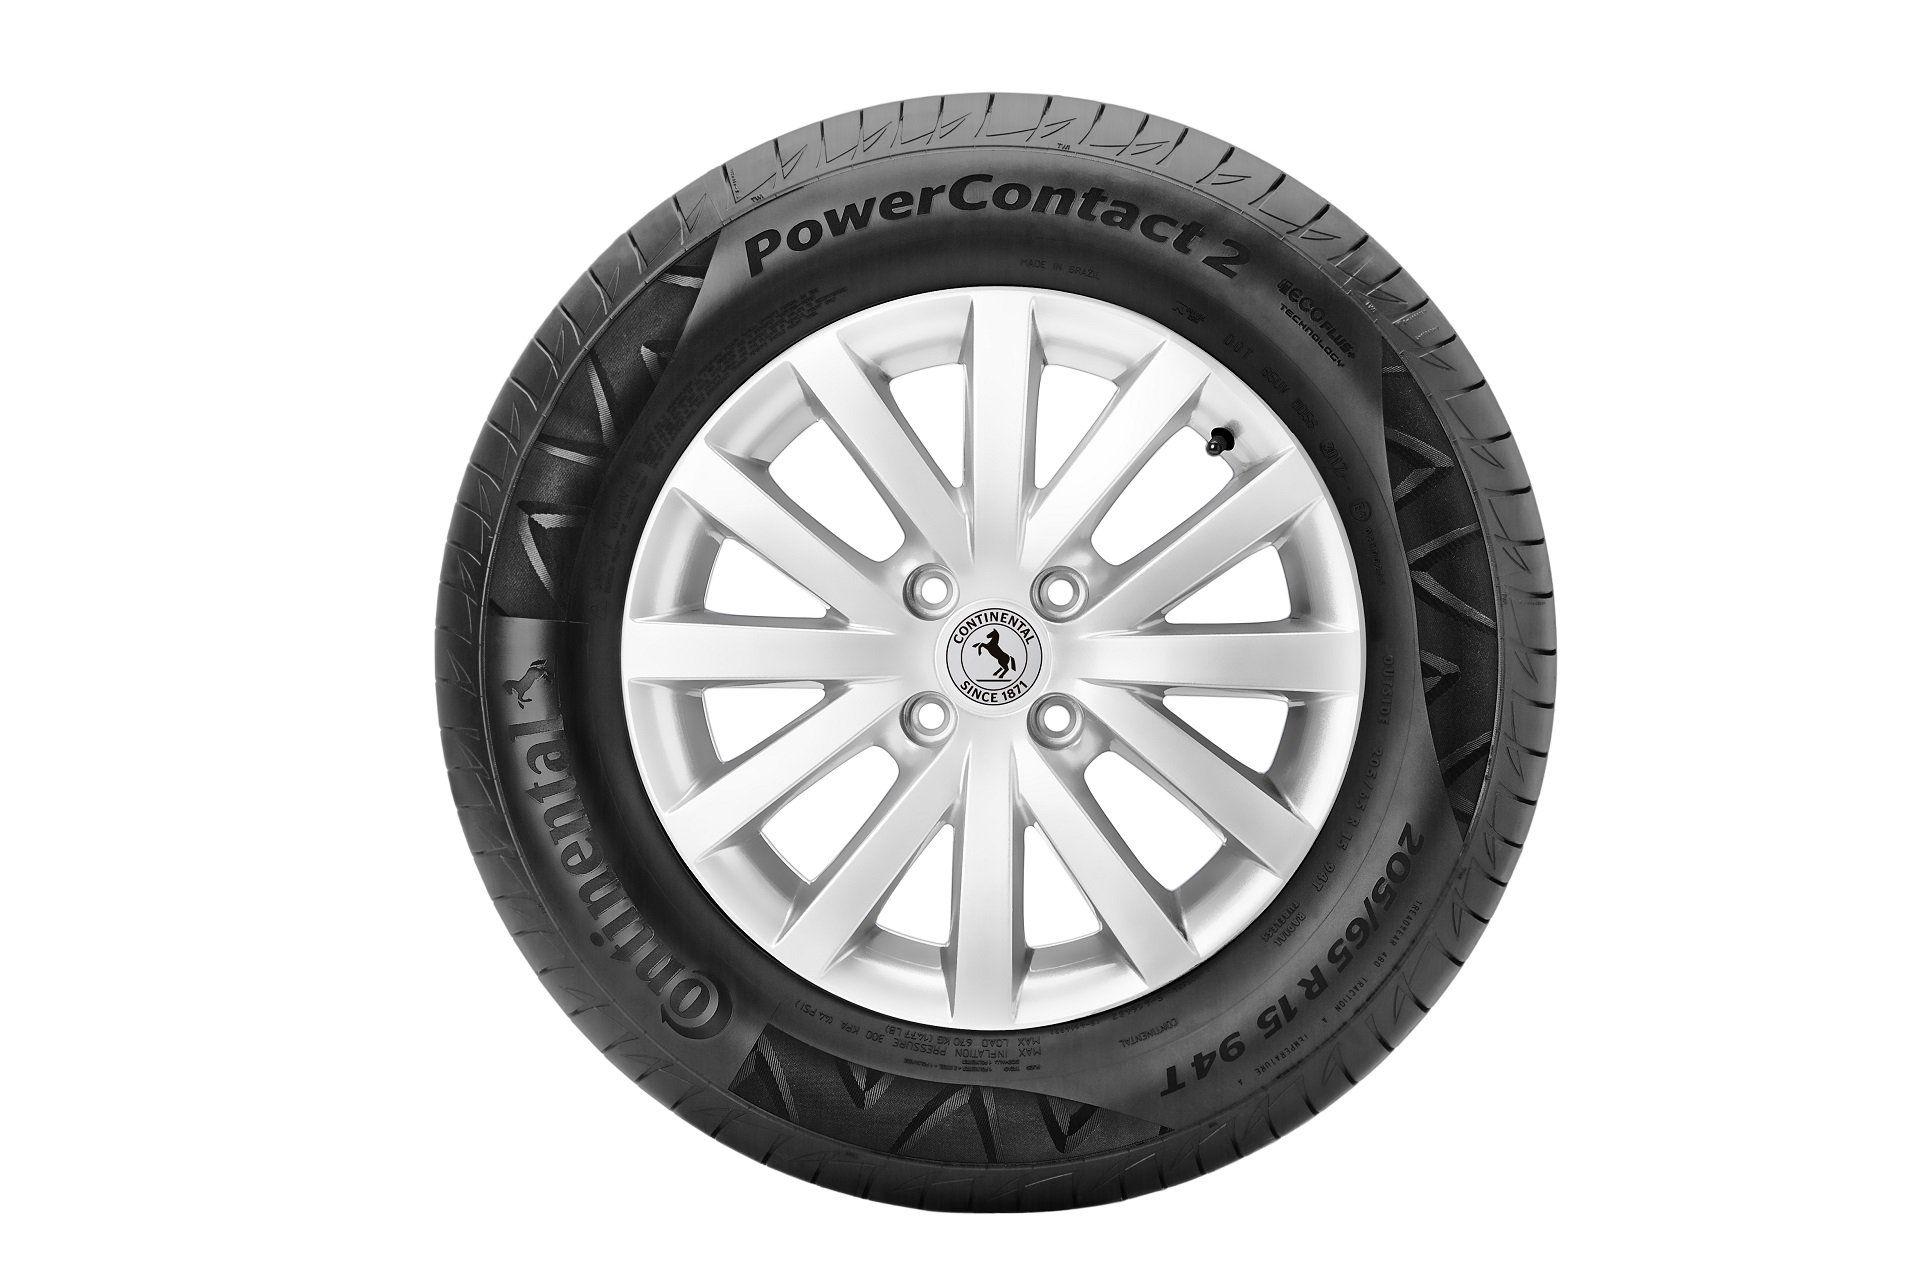 Pneu Continental 195/55R16 87H FR ContiPowerContact 2